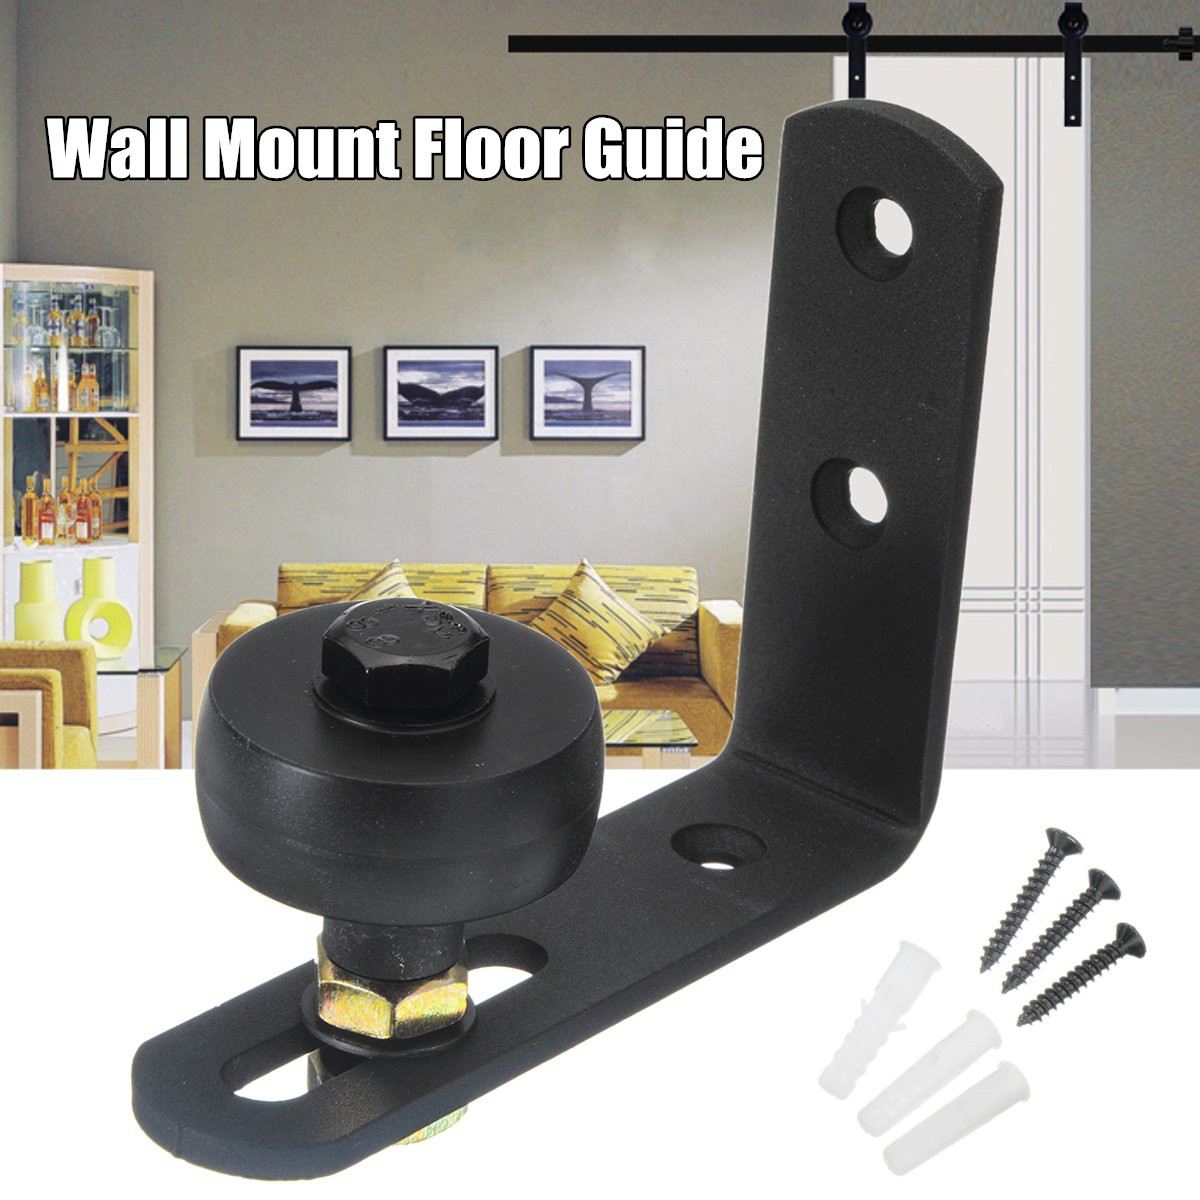 Bottom Floor Guide Stay Rollers Adjustable For Sliding Barn Door Hardware Stay Roller floorguide Kits with Screws